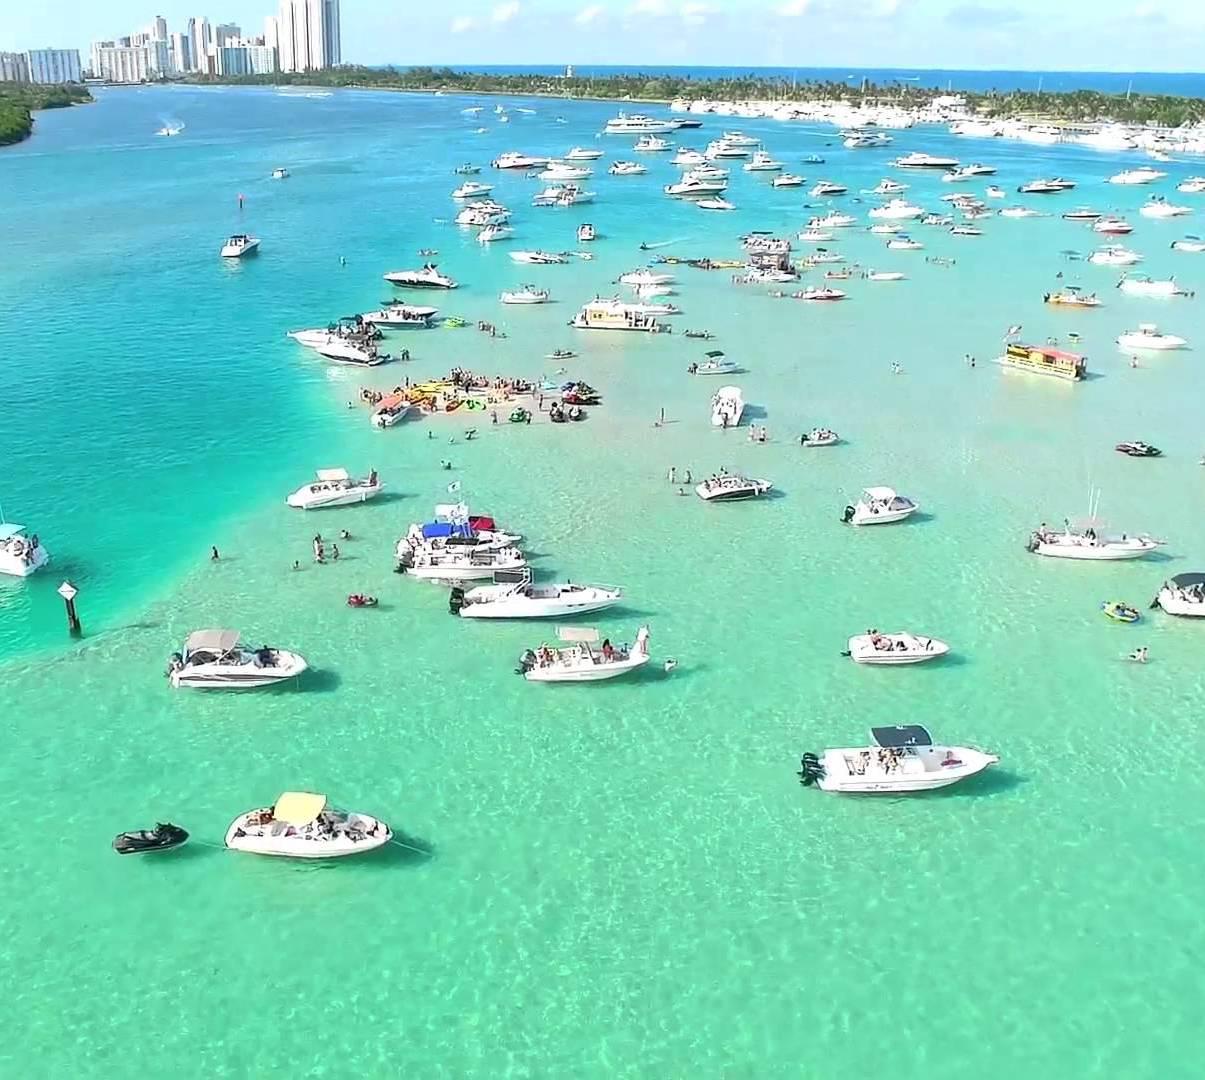 marina party cruises event